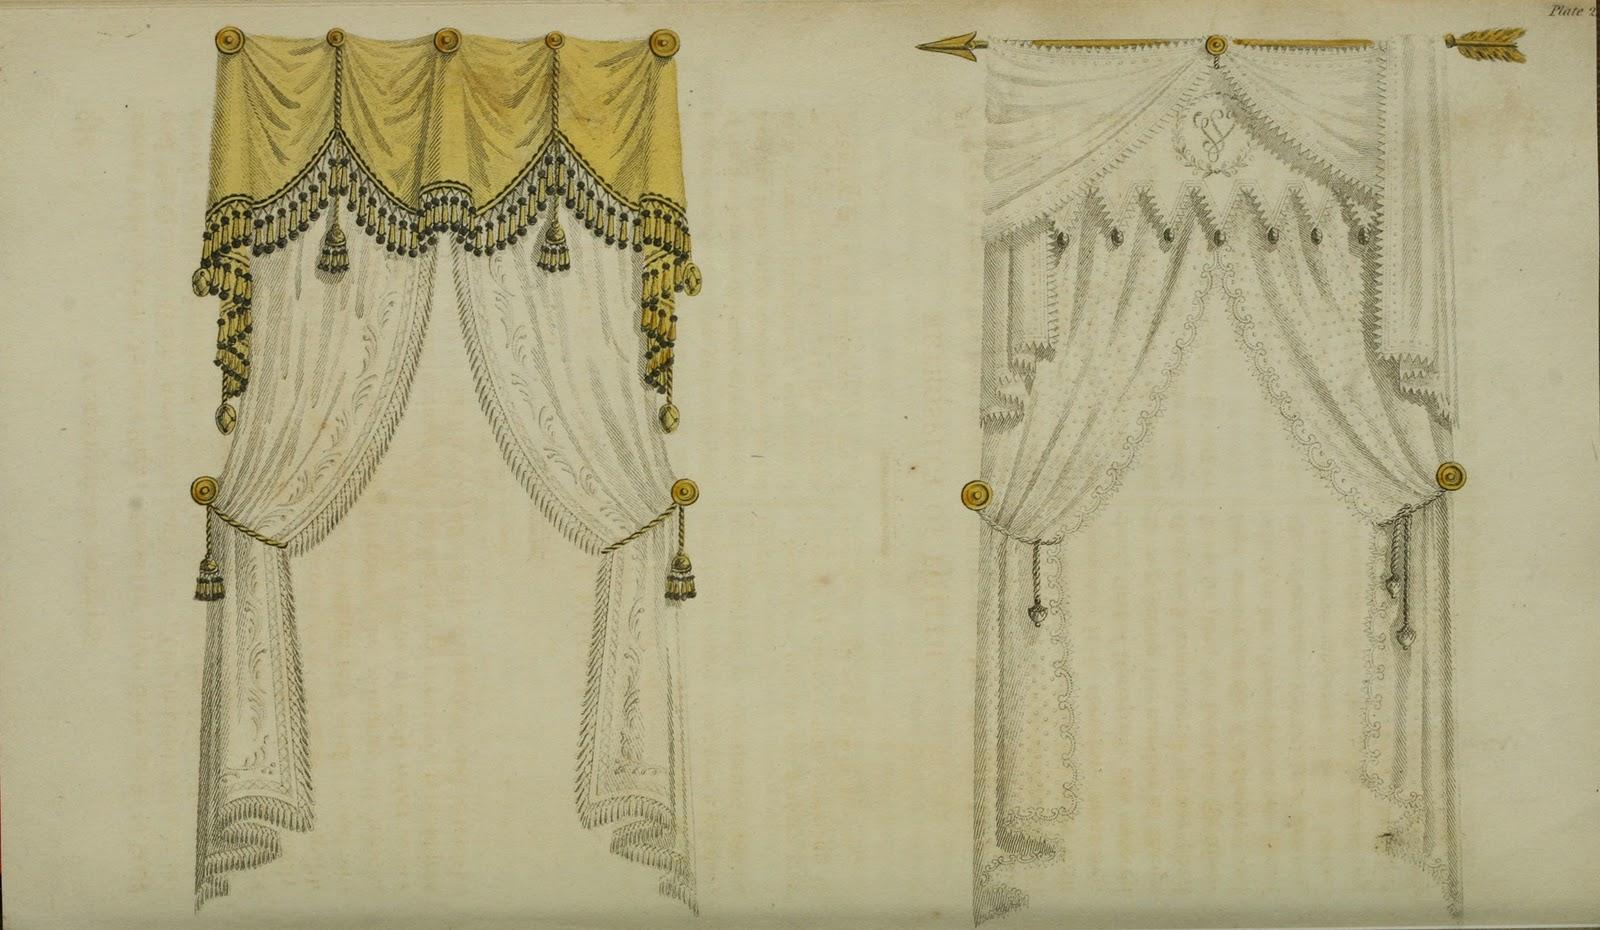 ekduncan - my fanciful muse  regency era curtains